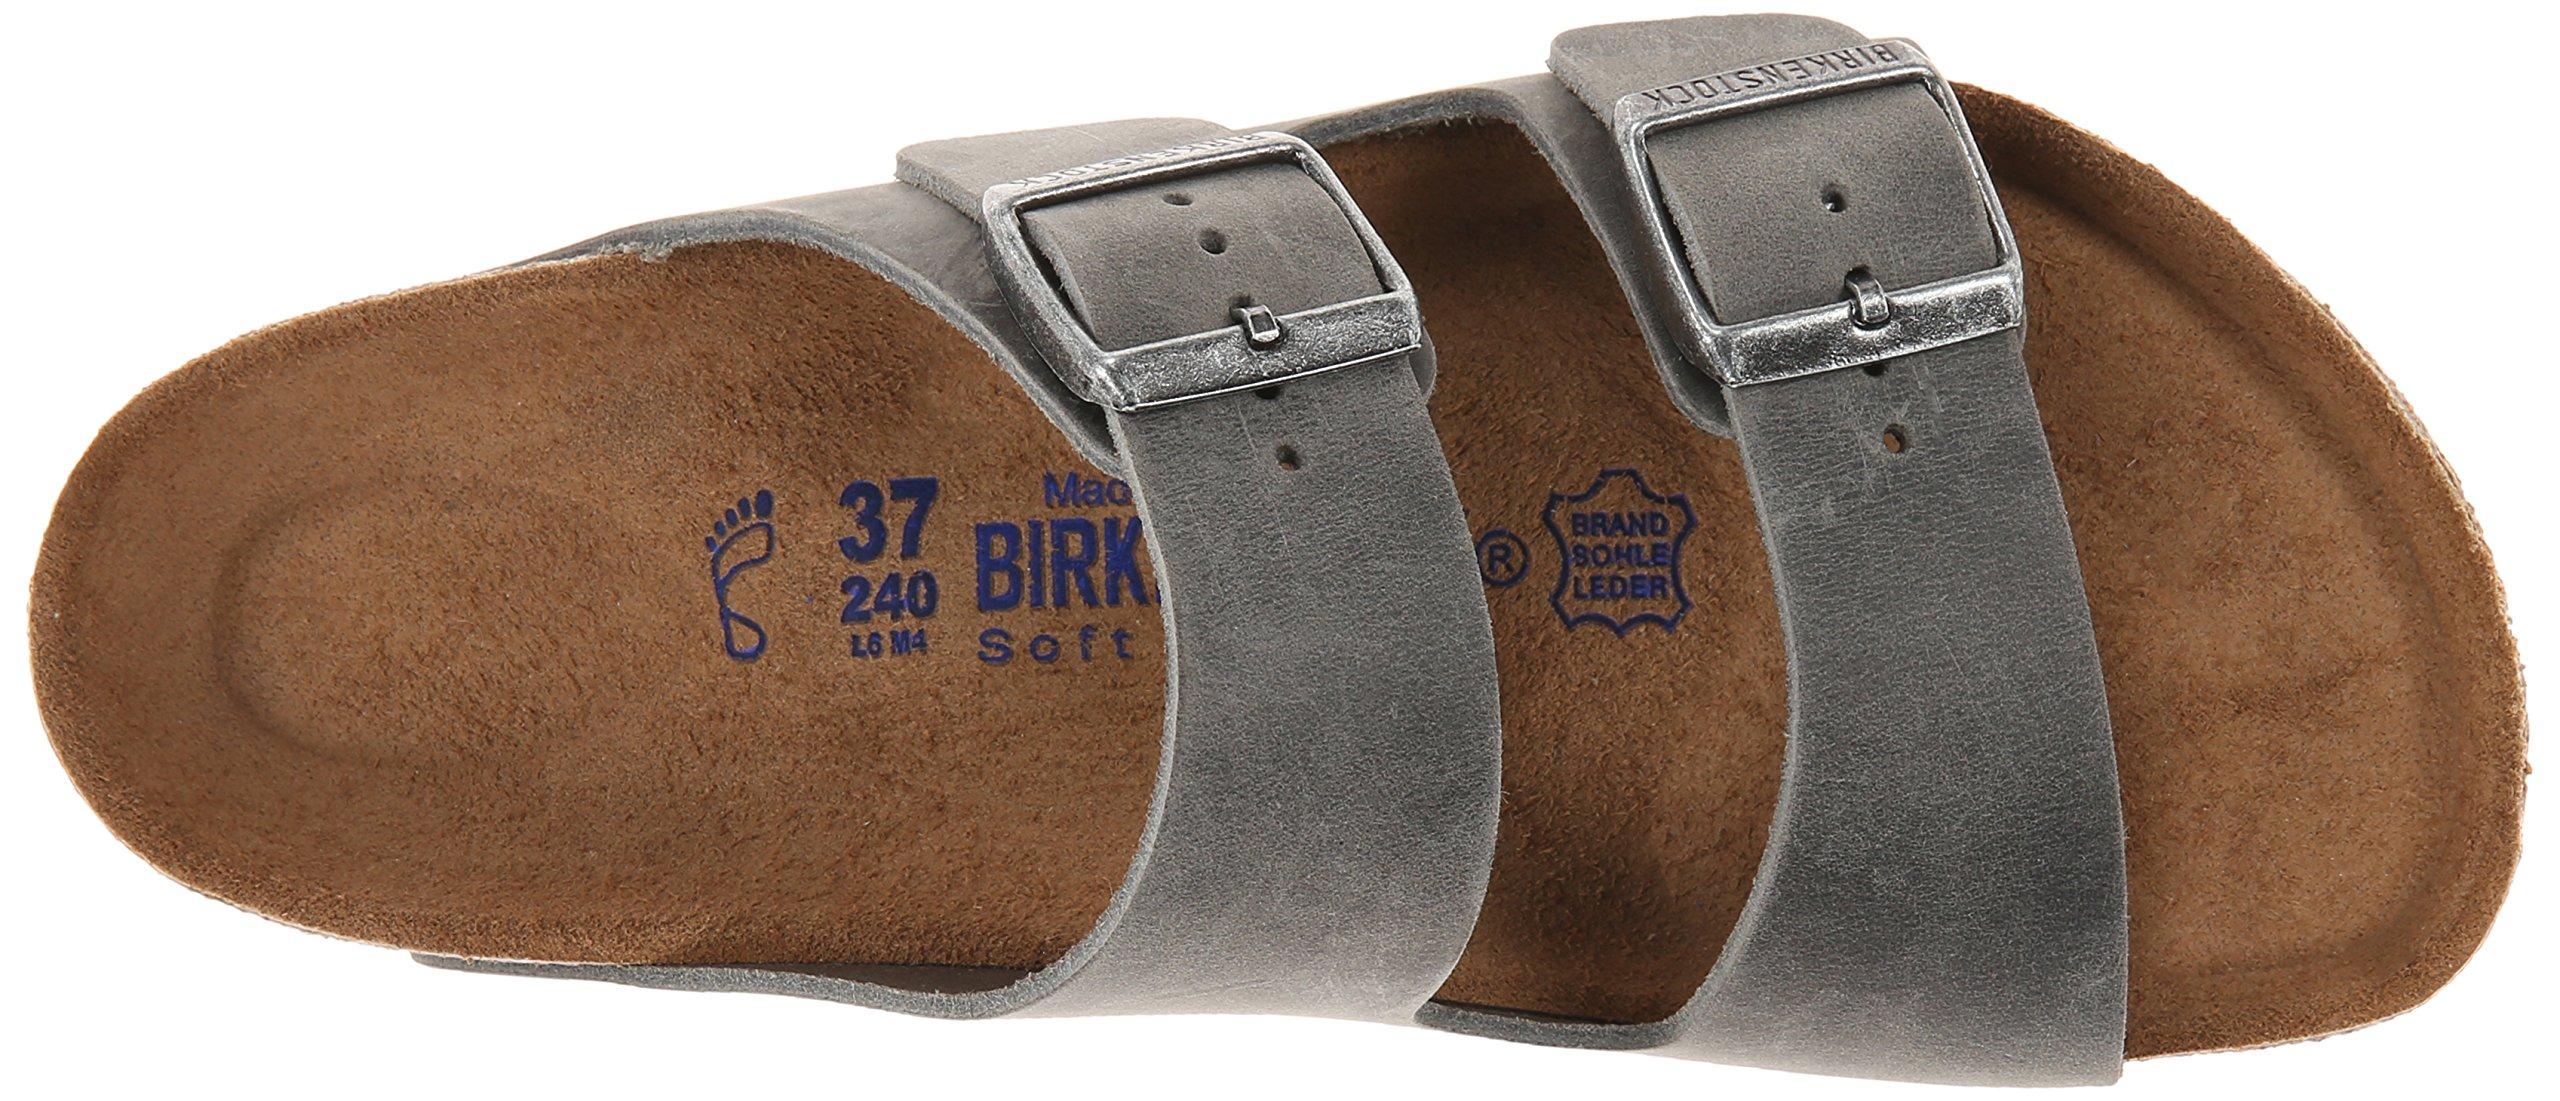 Birkenstock Unisex Arizona Iron Oiled Leather Sandals - 45 M EU/12-12.5 B(M) US Men by Birkenstock (Image #8)